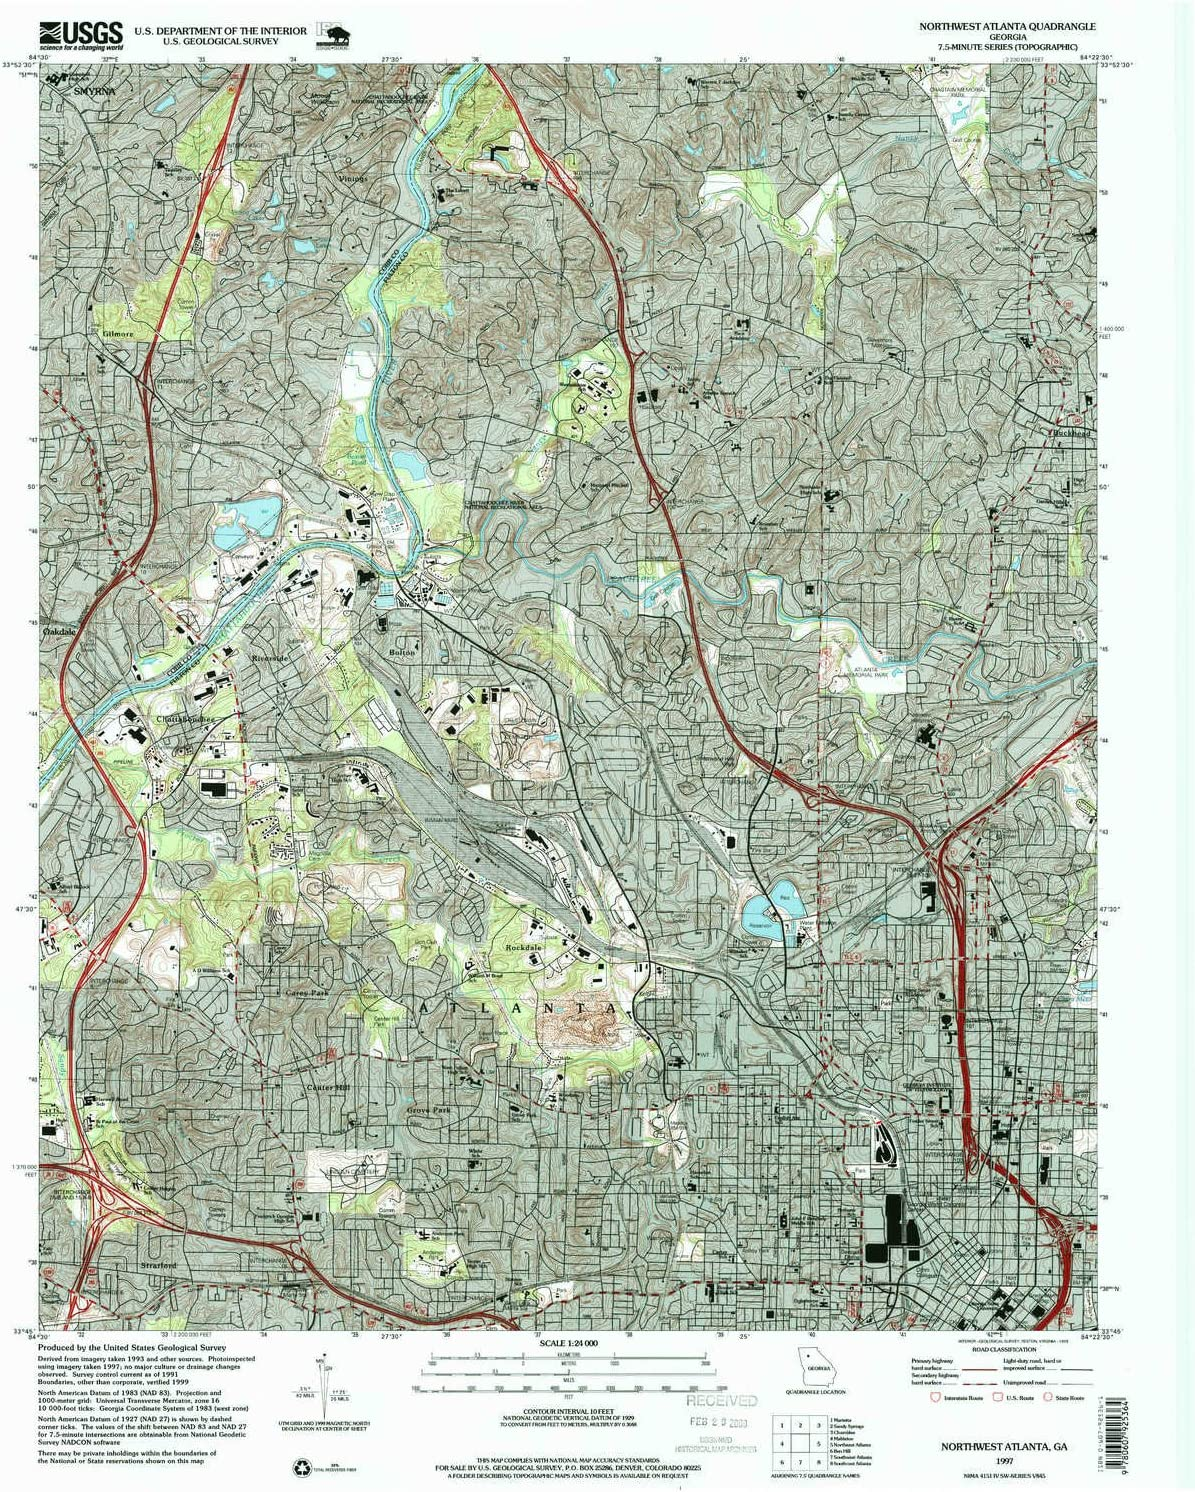 YellowMaps Northwest Atlanta GA topo map 7 7.5 1:24000 X Ranking TOP8 Scale Excellent